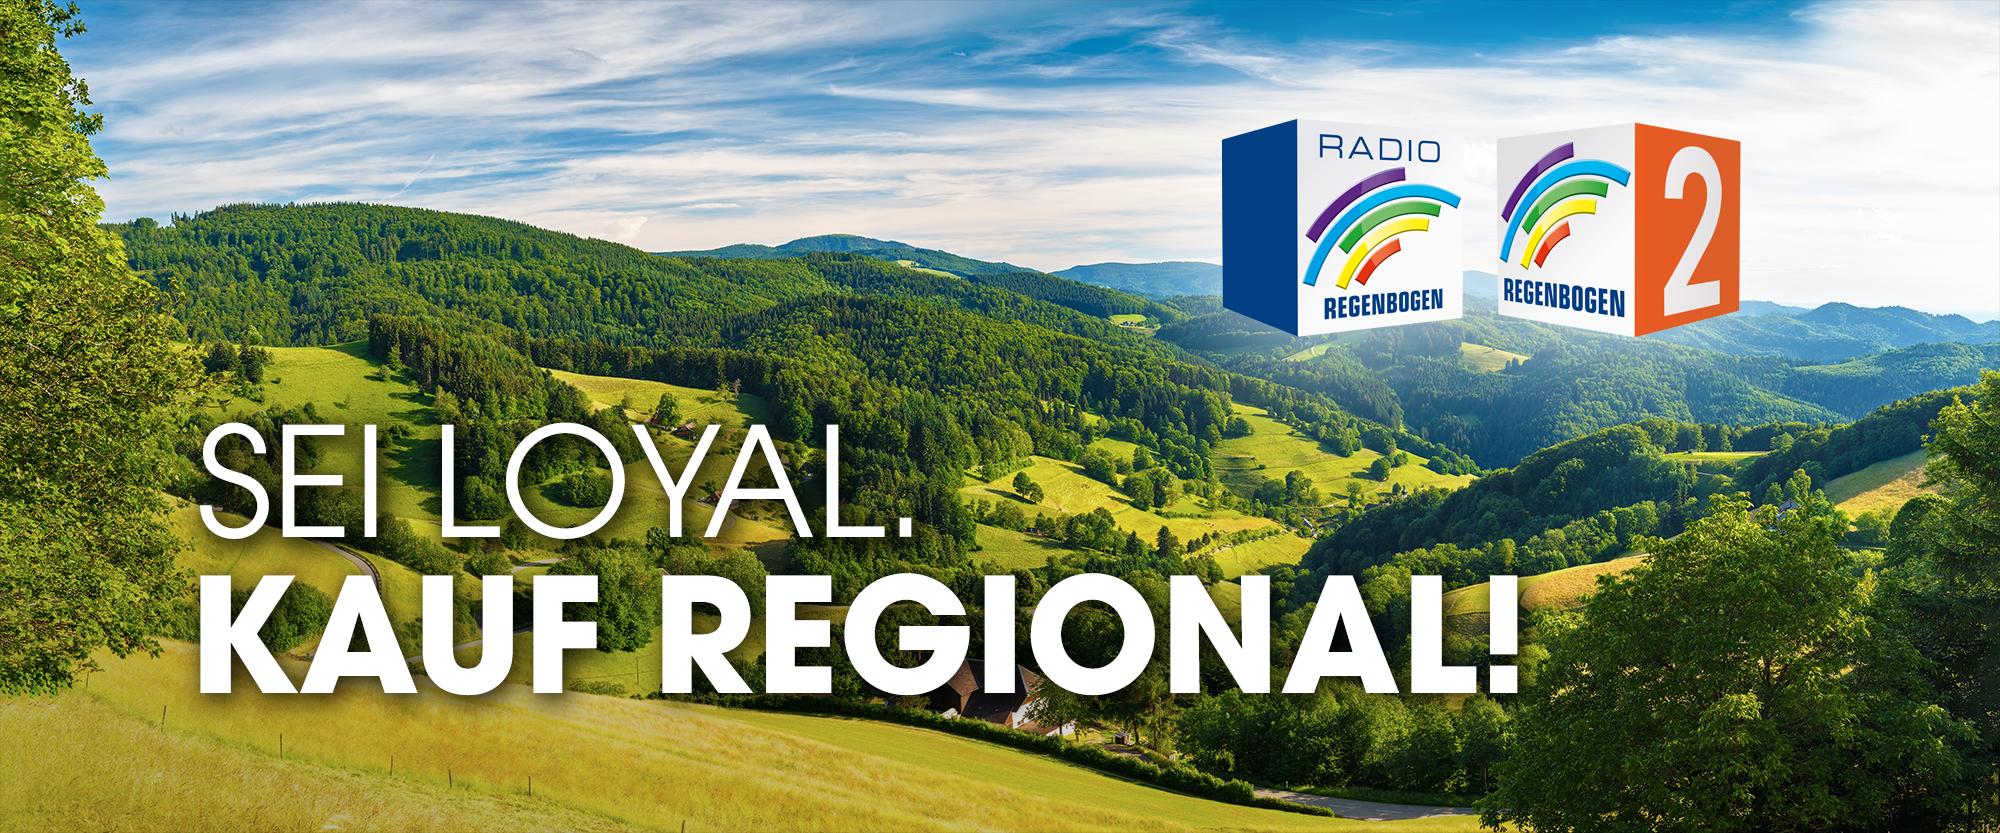 Kauf-regional-Titel.png